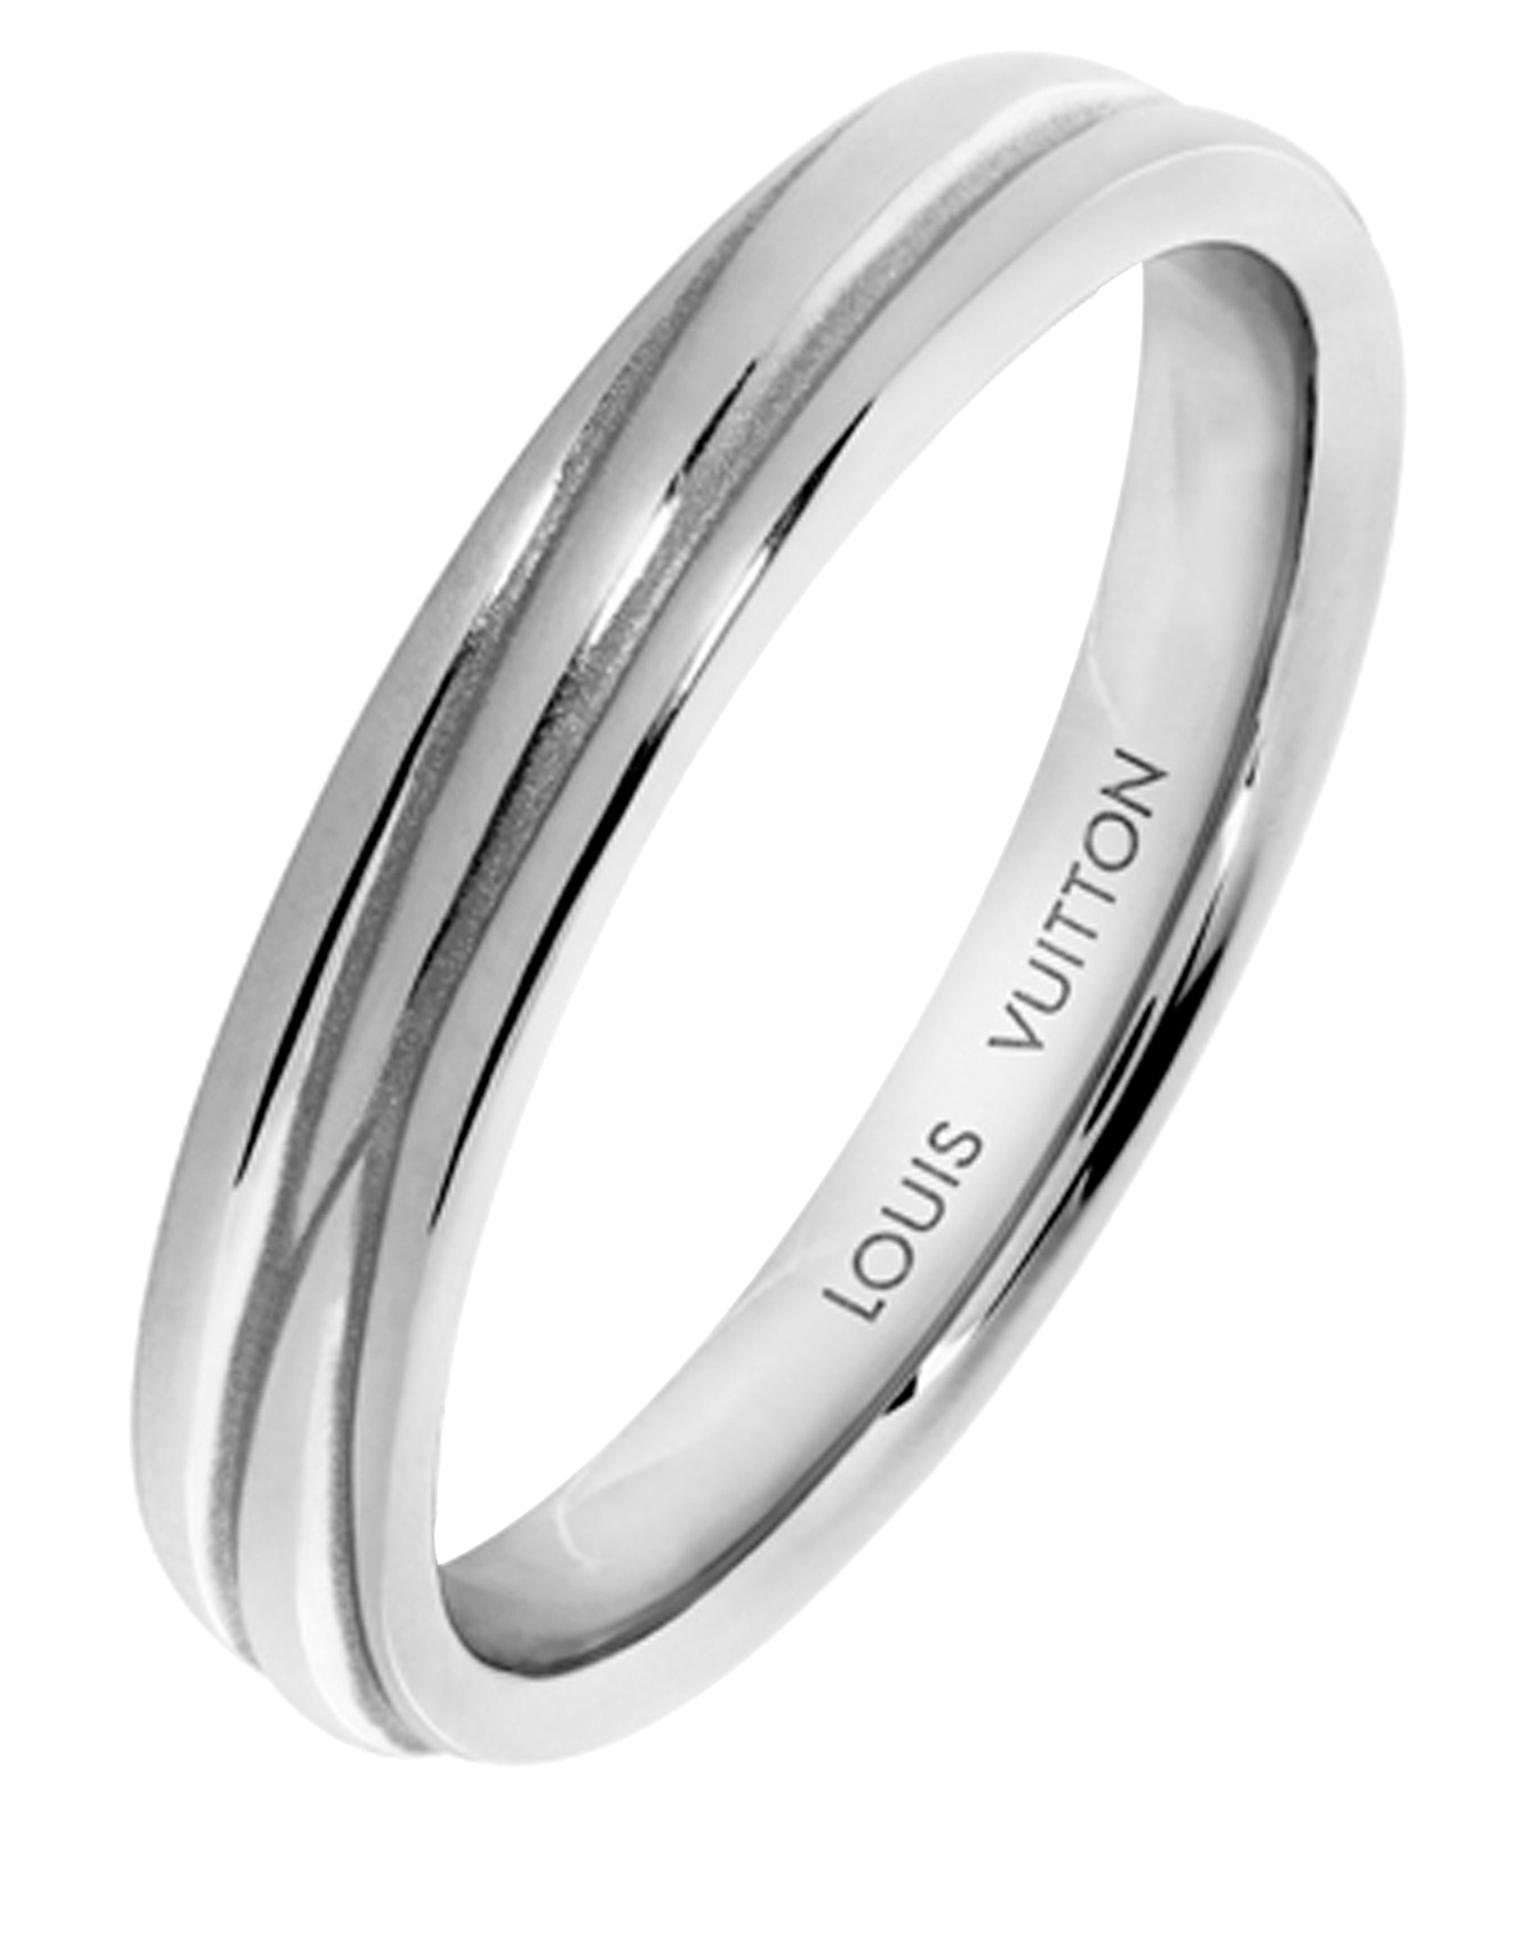 epi wedding band in platinum louis vuitton the jewellery editor